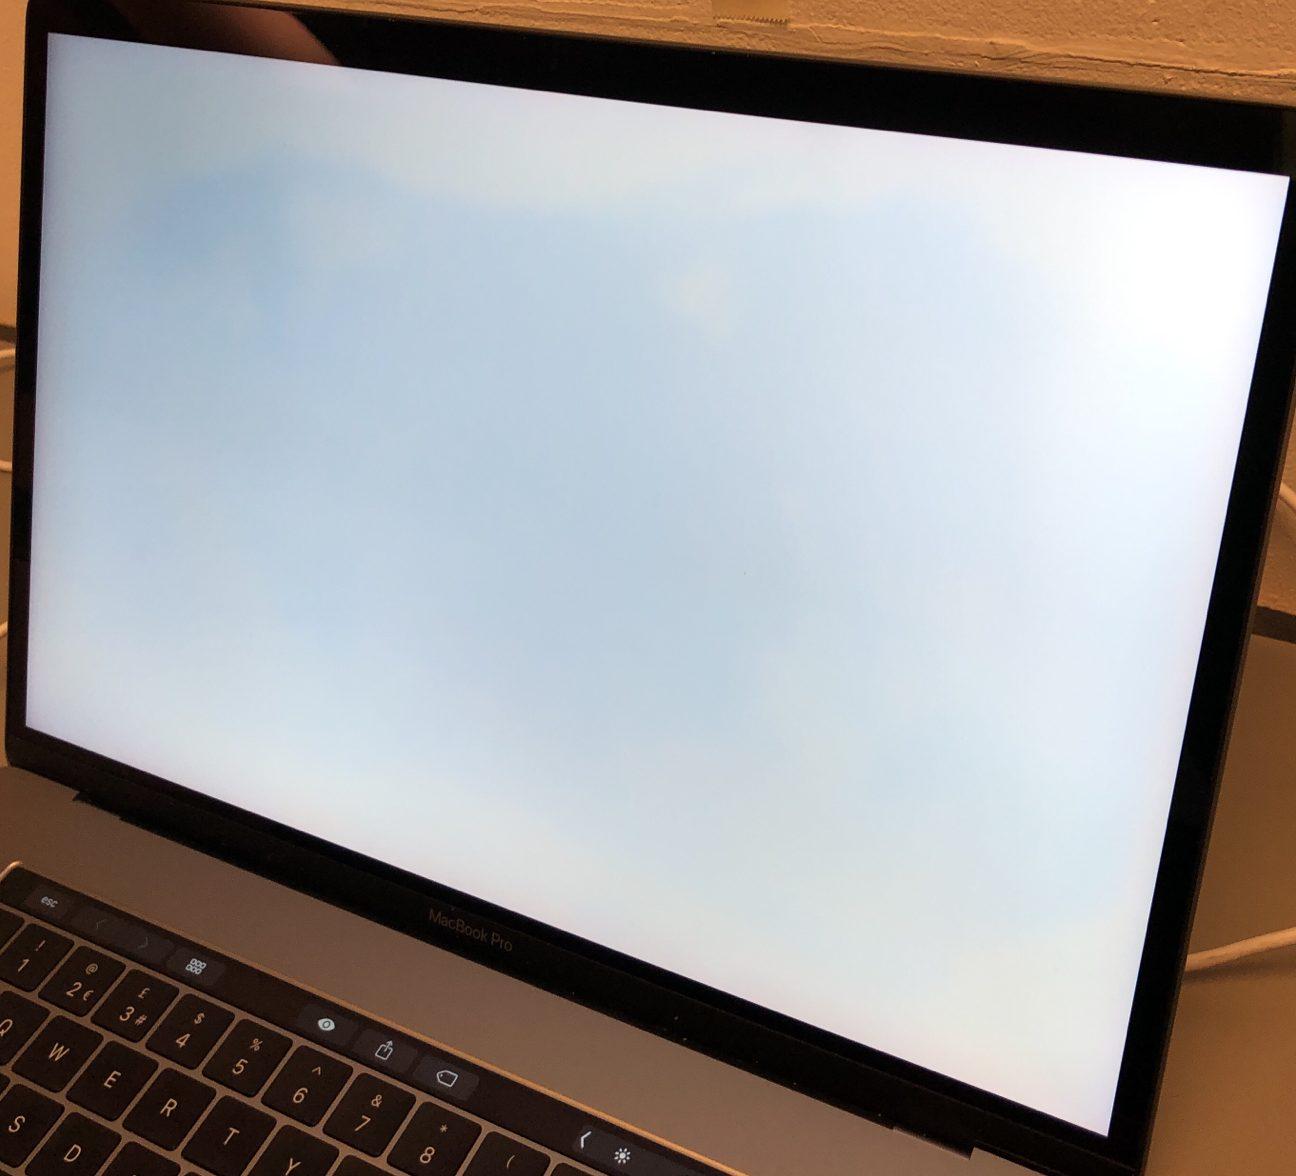 "MacBook Pro 15"" Touch Bar Mid 2017 (Intel Quad-Core i7 2.8 GHz 16 GB RAM 256 GB SSD), Space Gray, Intel Quad-Core i7 2.8 GHz, 16 GB RAM, 256 GB SSD, image 3"